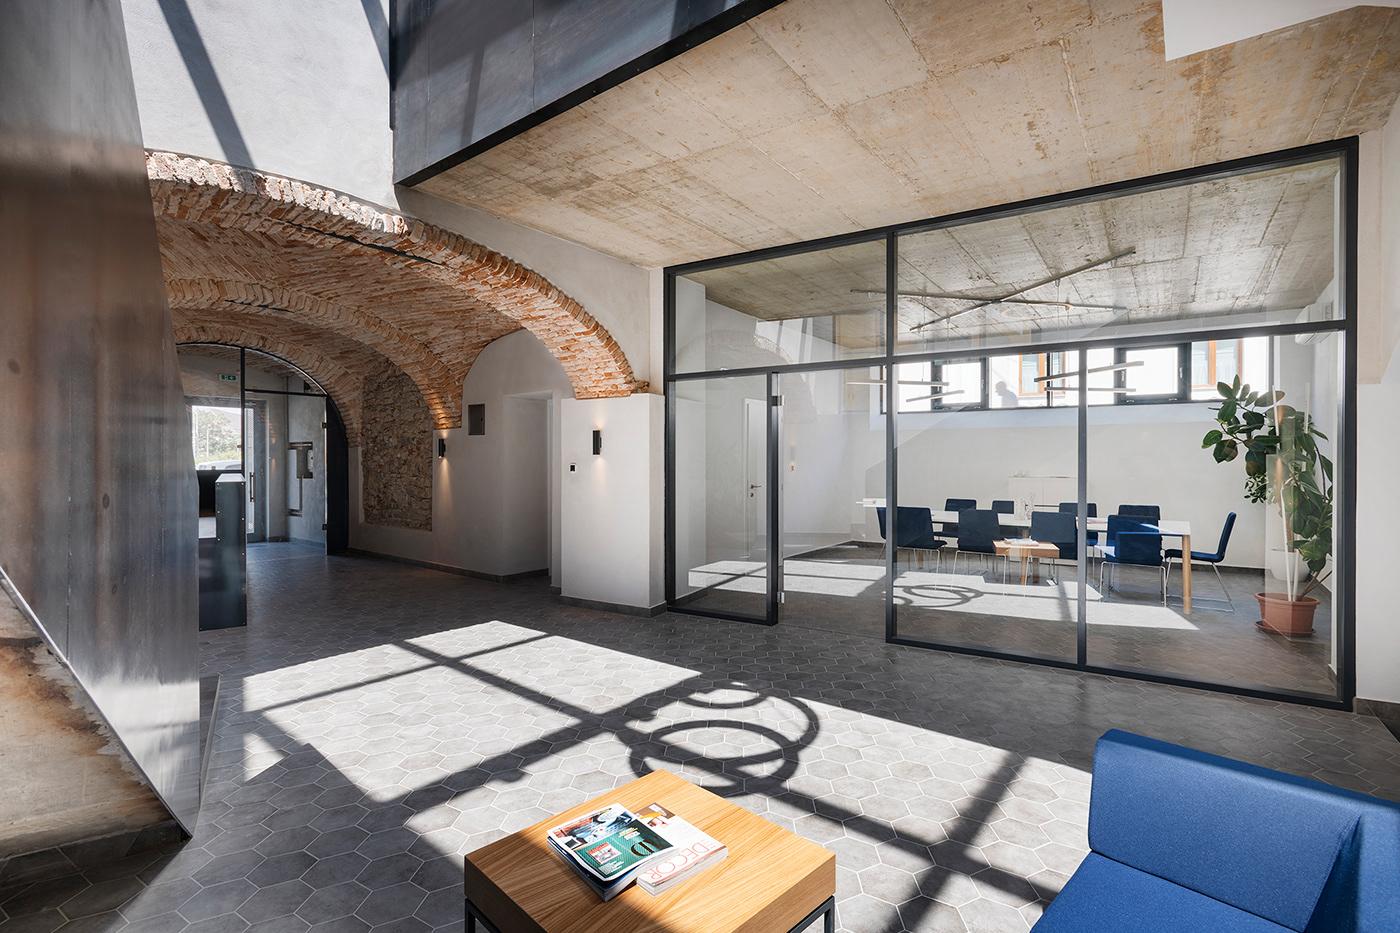 gasparbonta Office veszprém reconstruction industrial